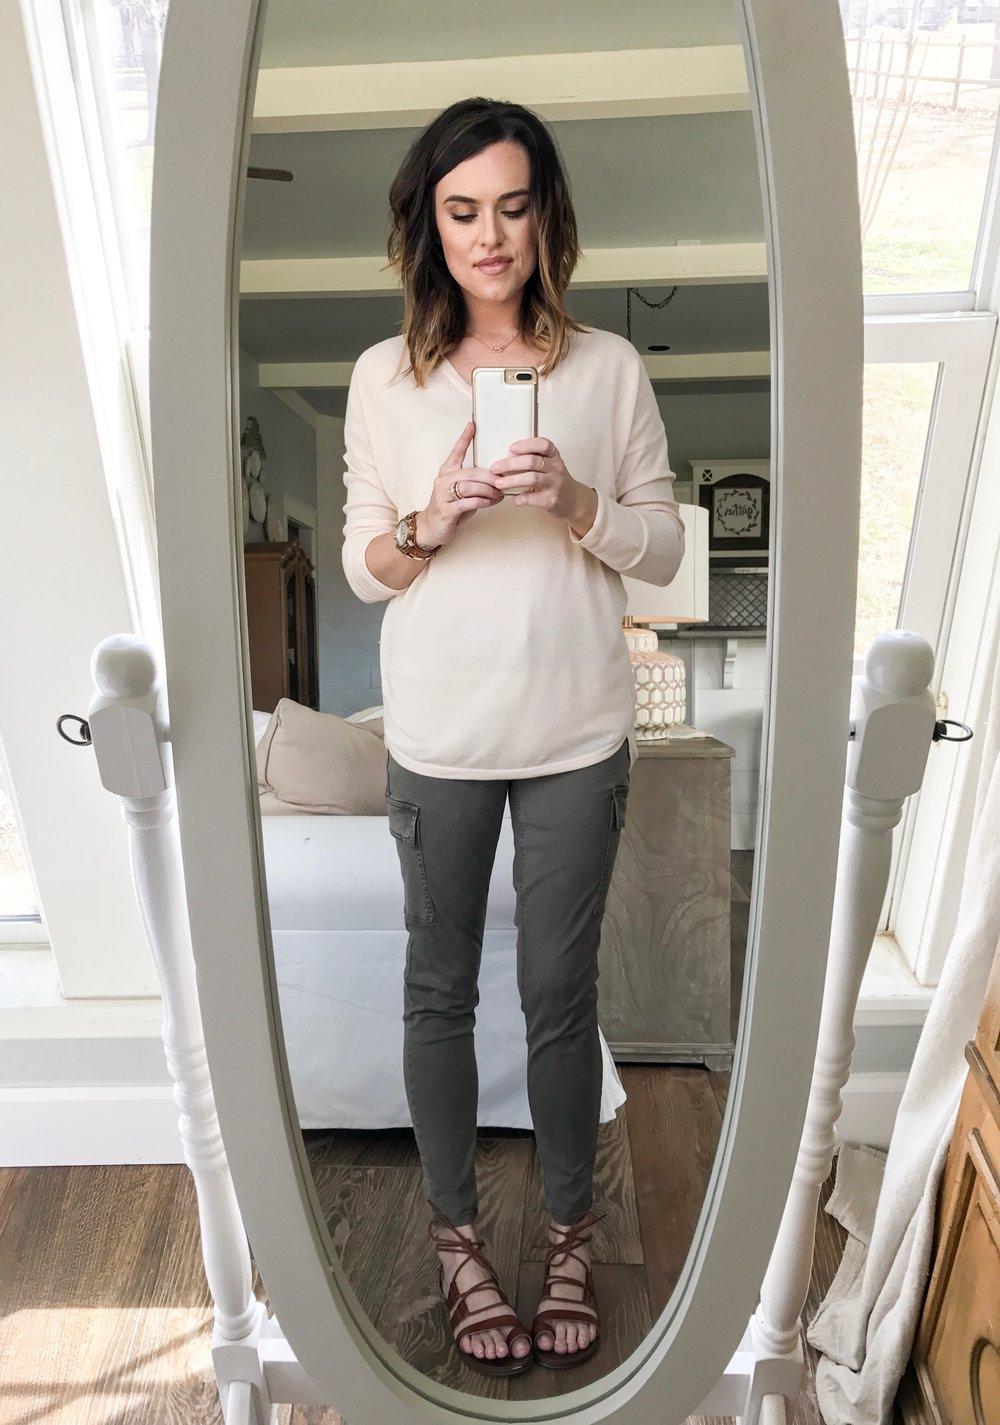 Cotton Stem Blog capsule wardrobe series army green pants pink sweater